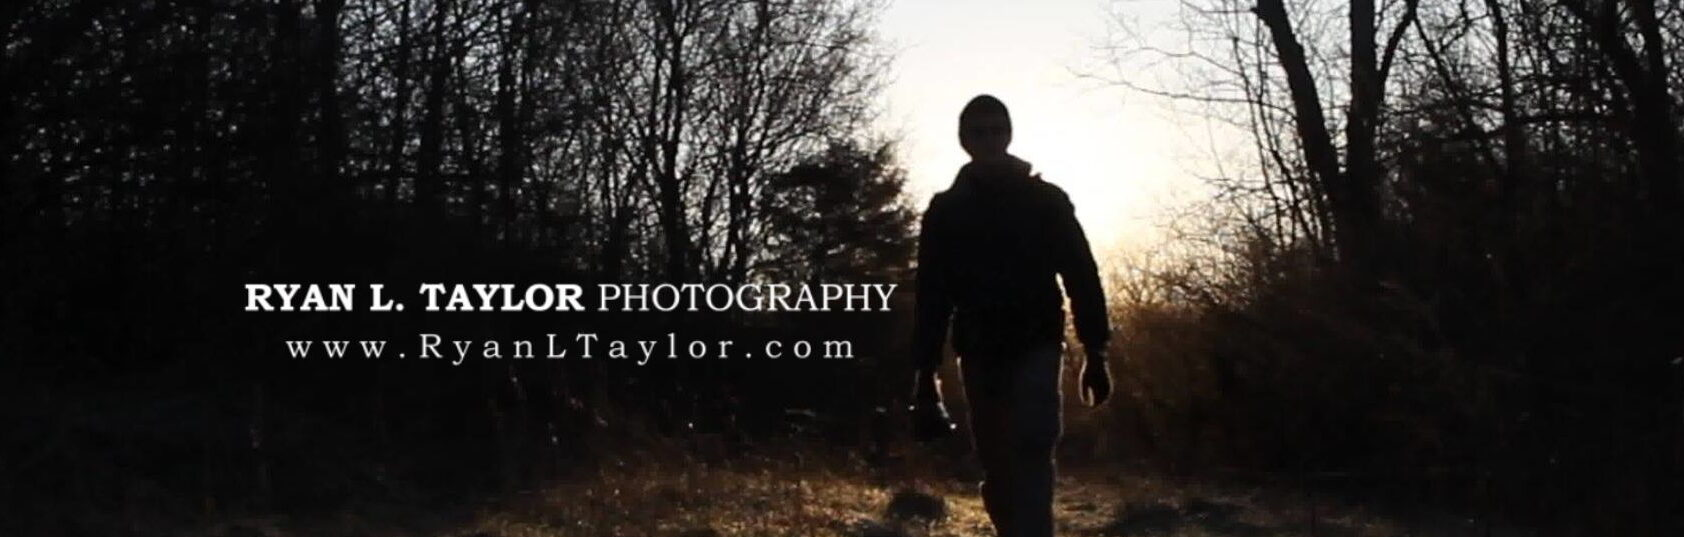 Ryan L. Taylor Photography